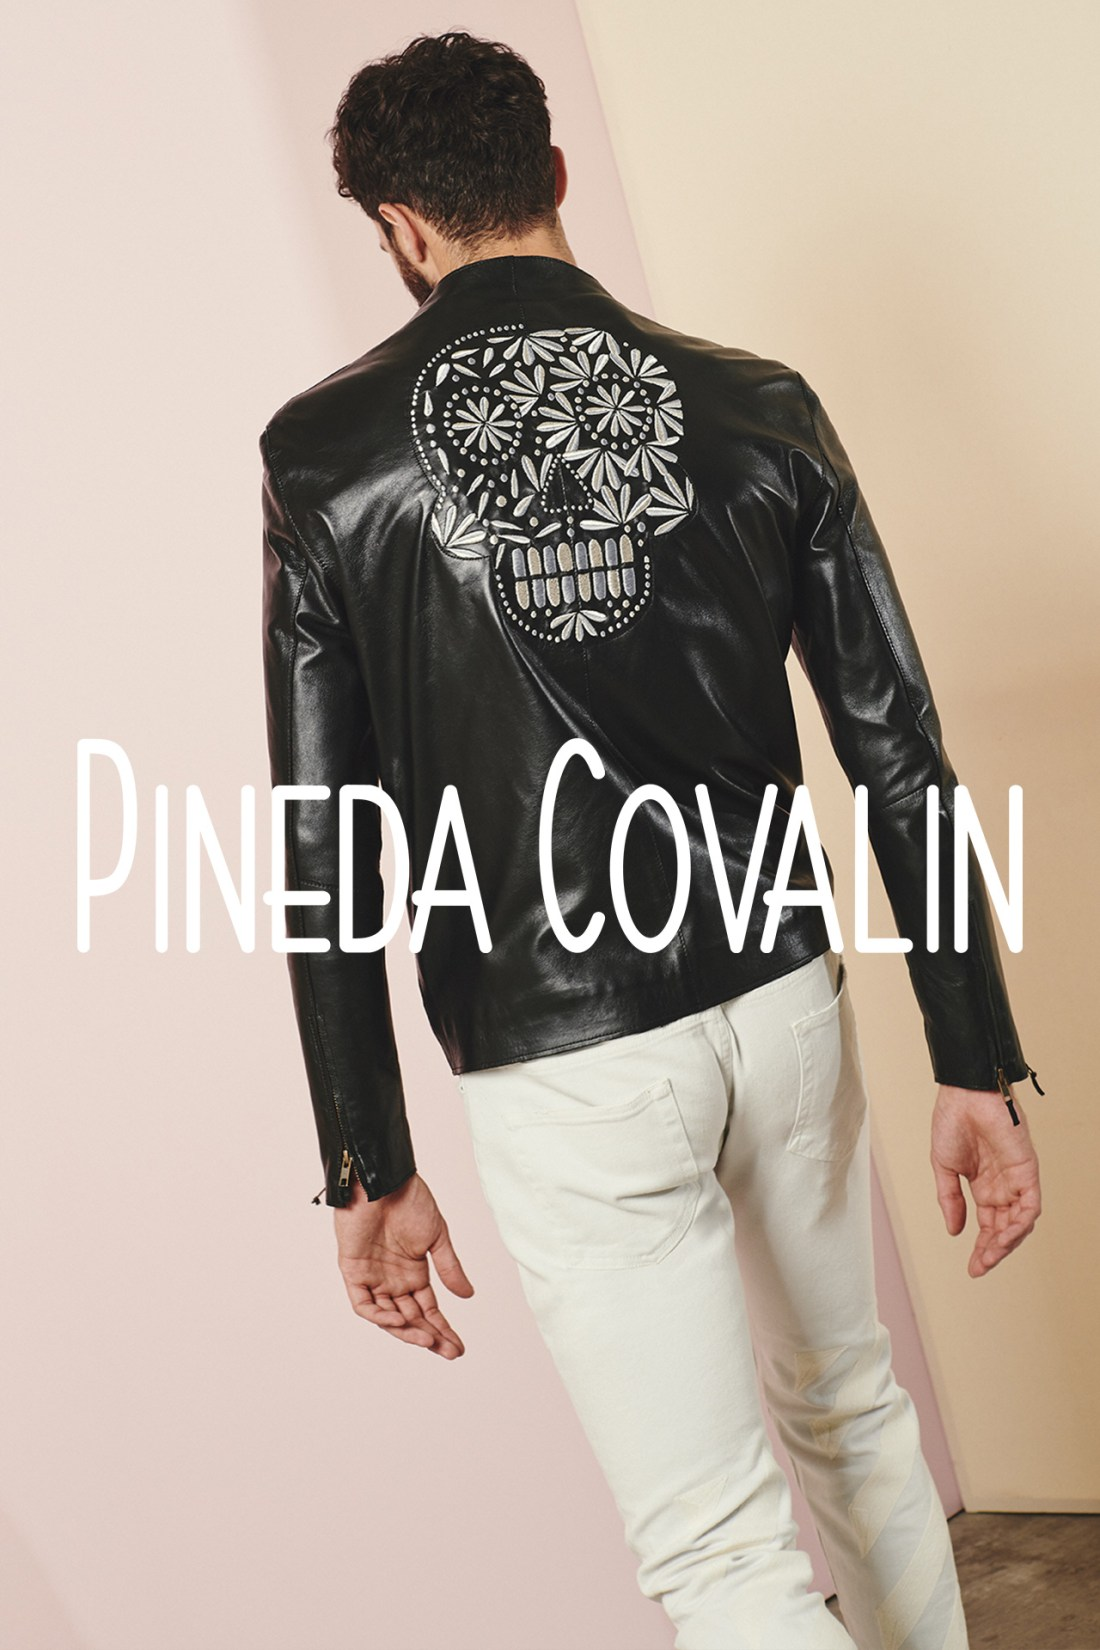 PinedaCovalin-7